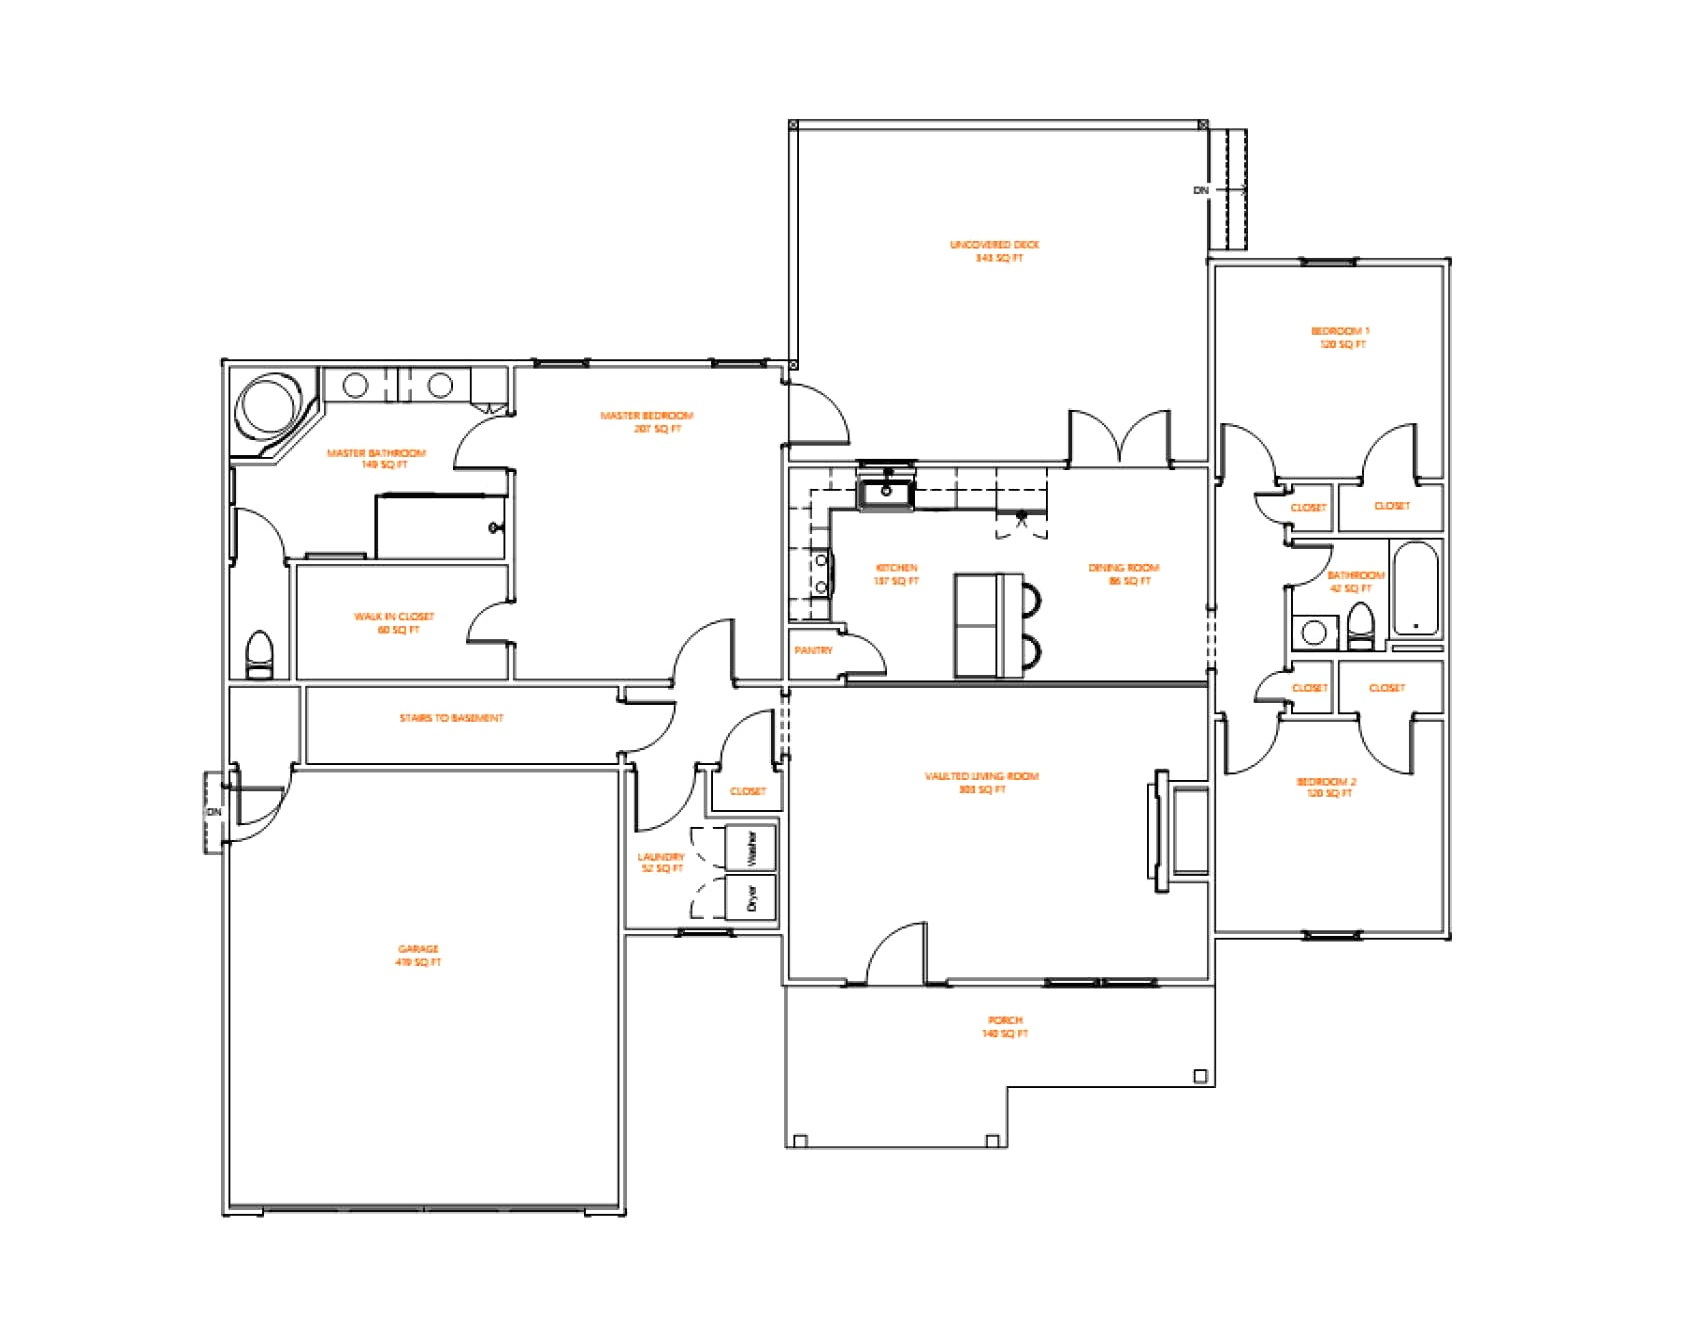 BMF+Tier+1+Conceptual+Floorplan.jpg